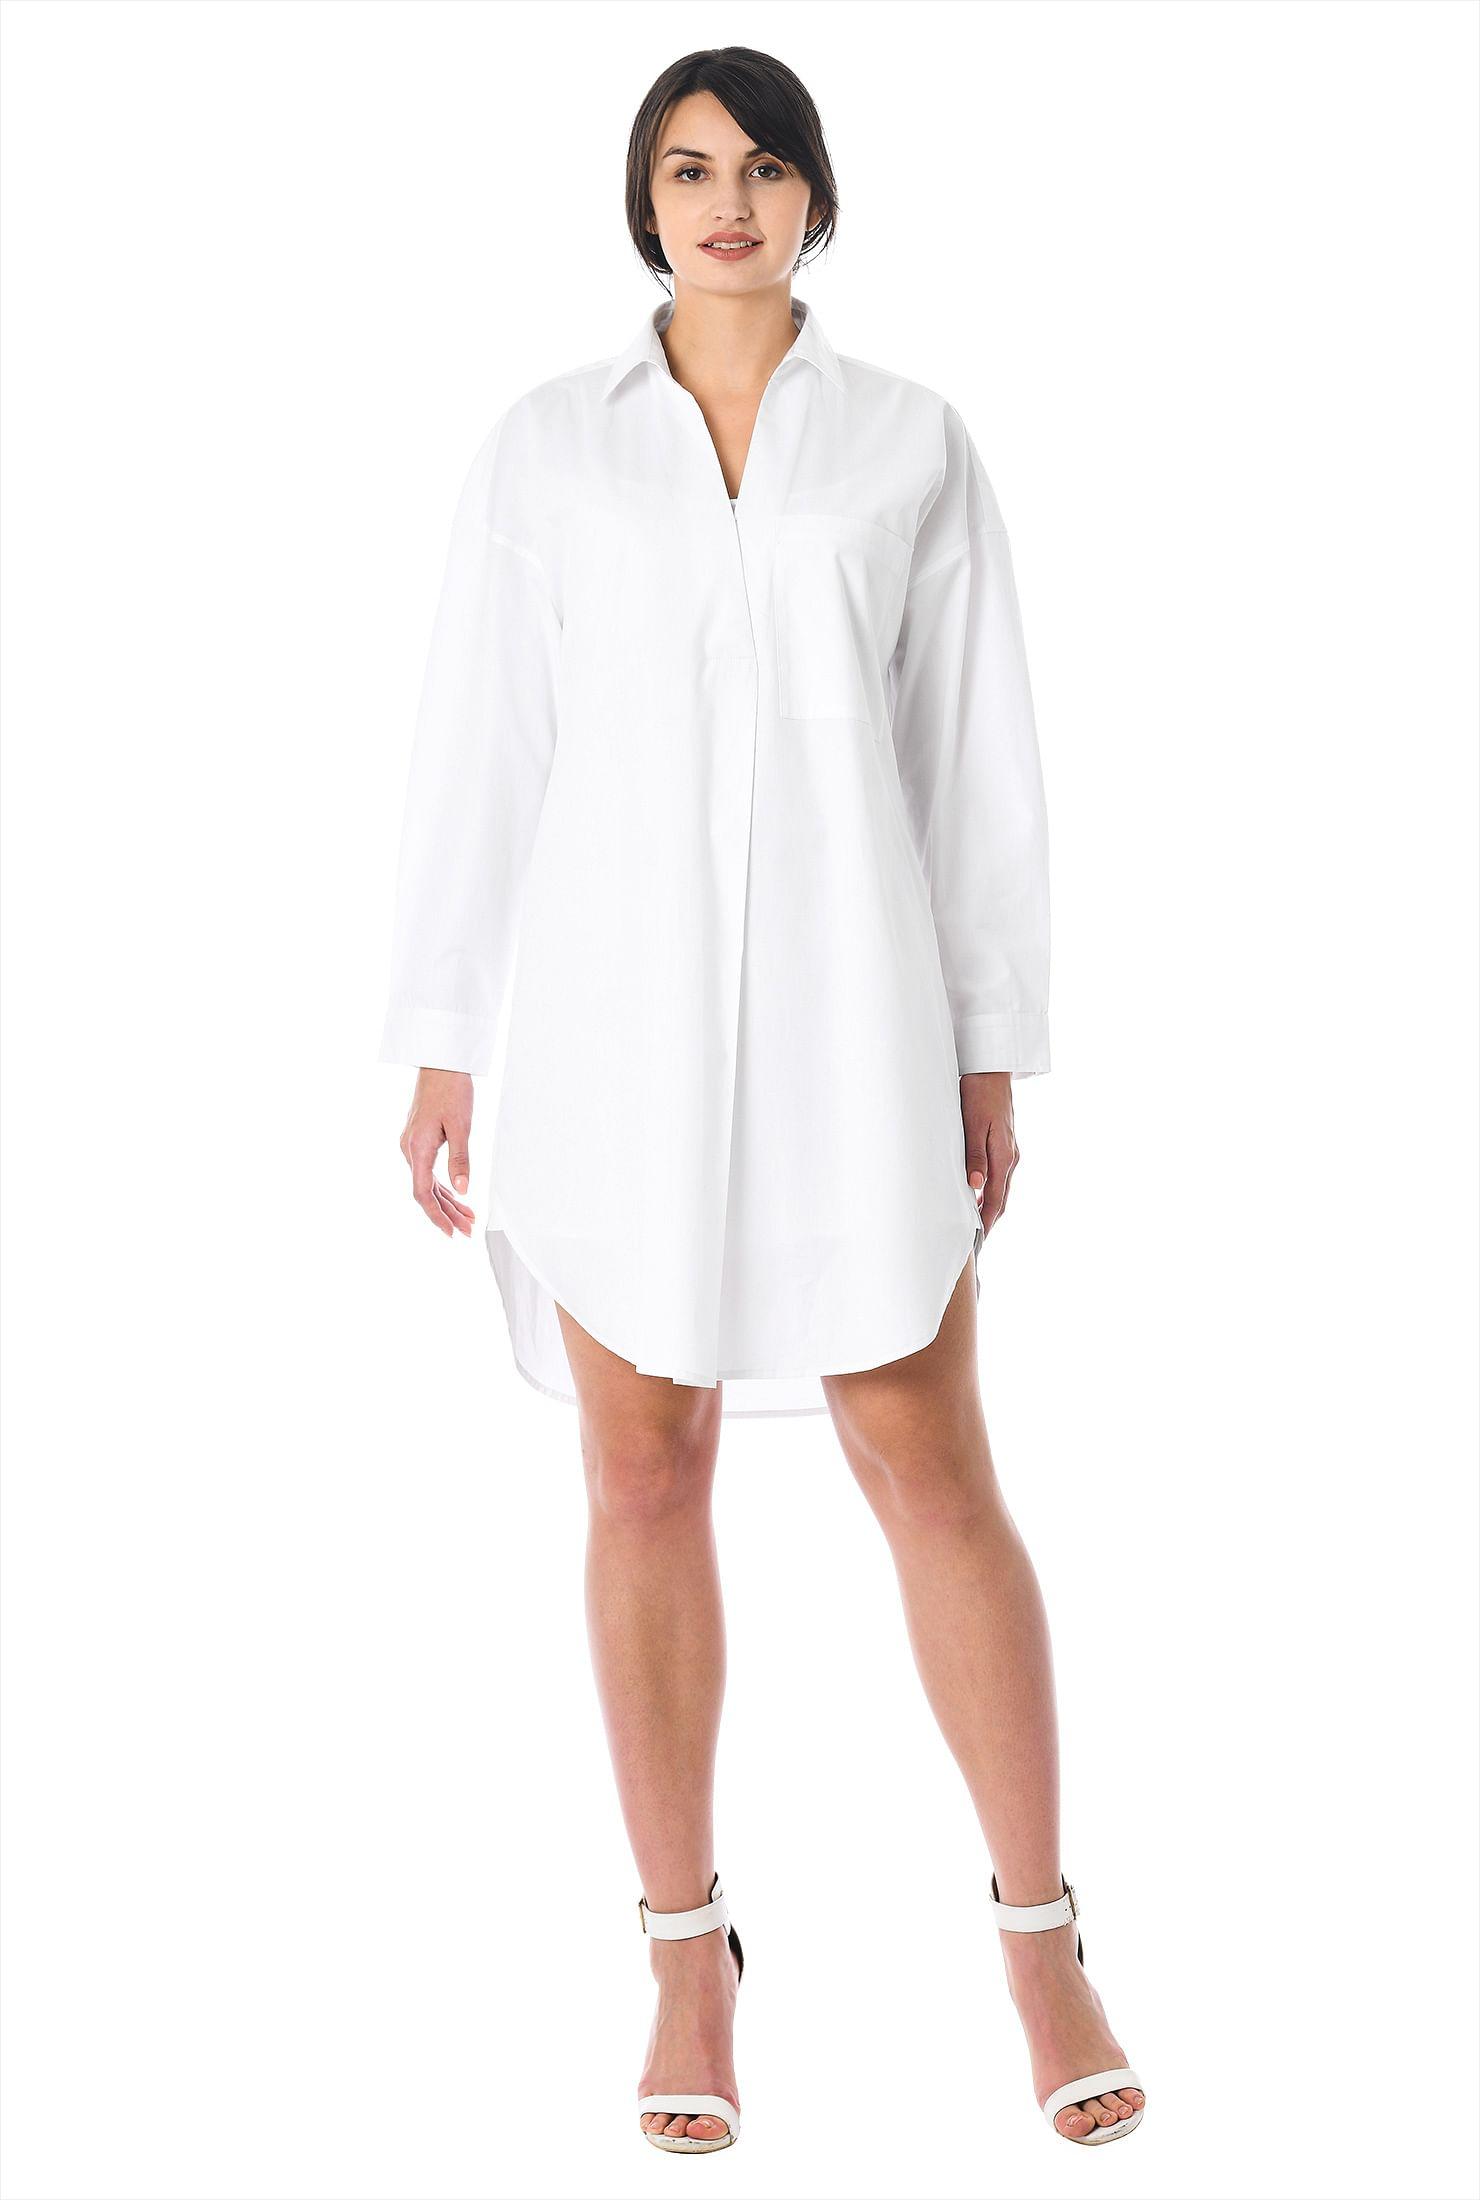 Cotton Poplin Relaxed Shirtdress by Eshakti